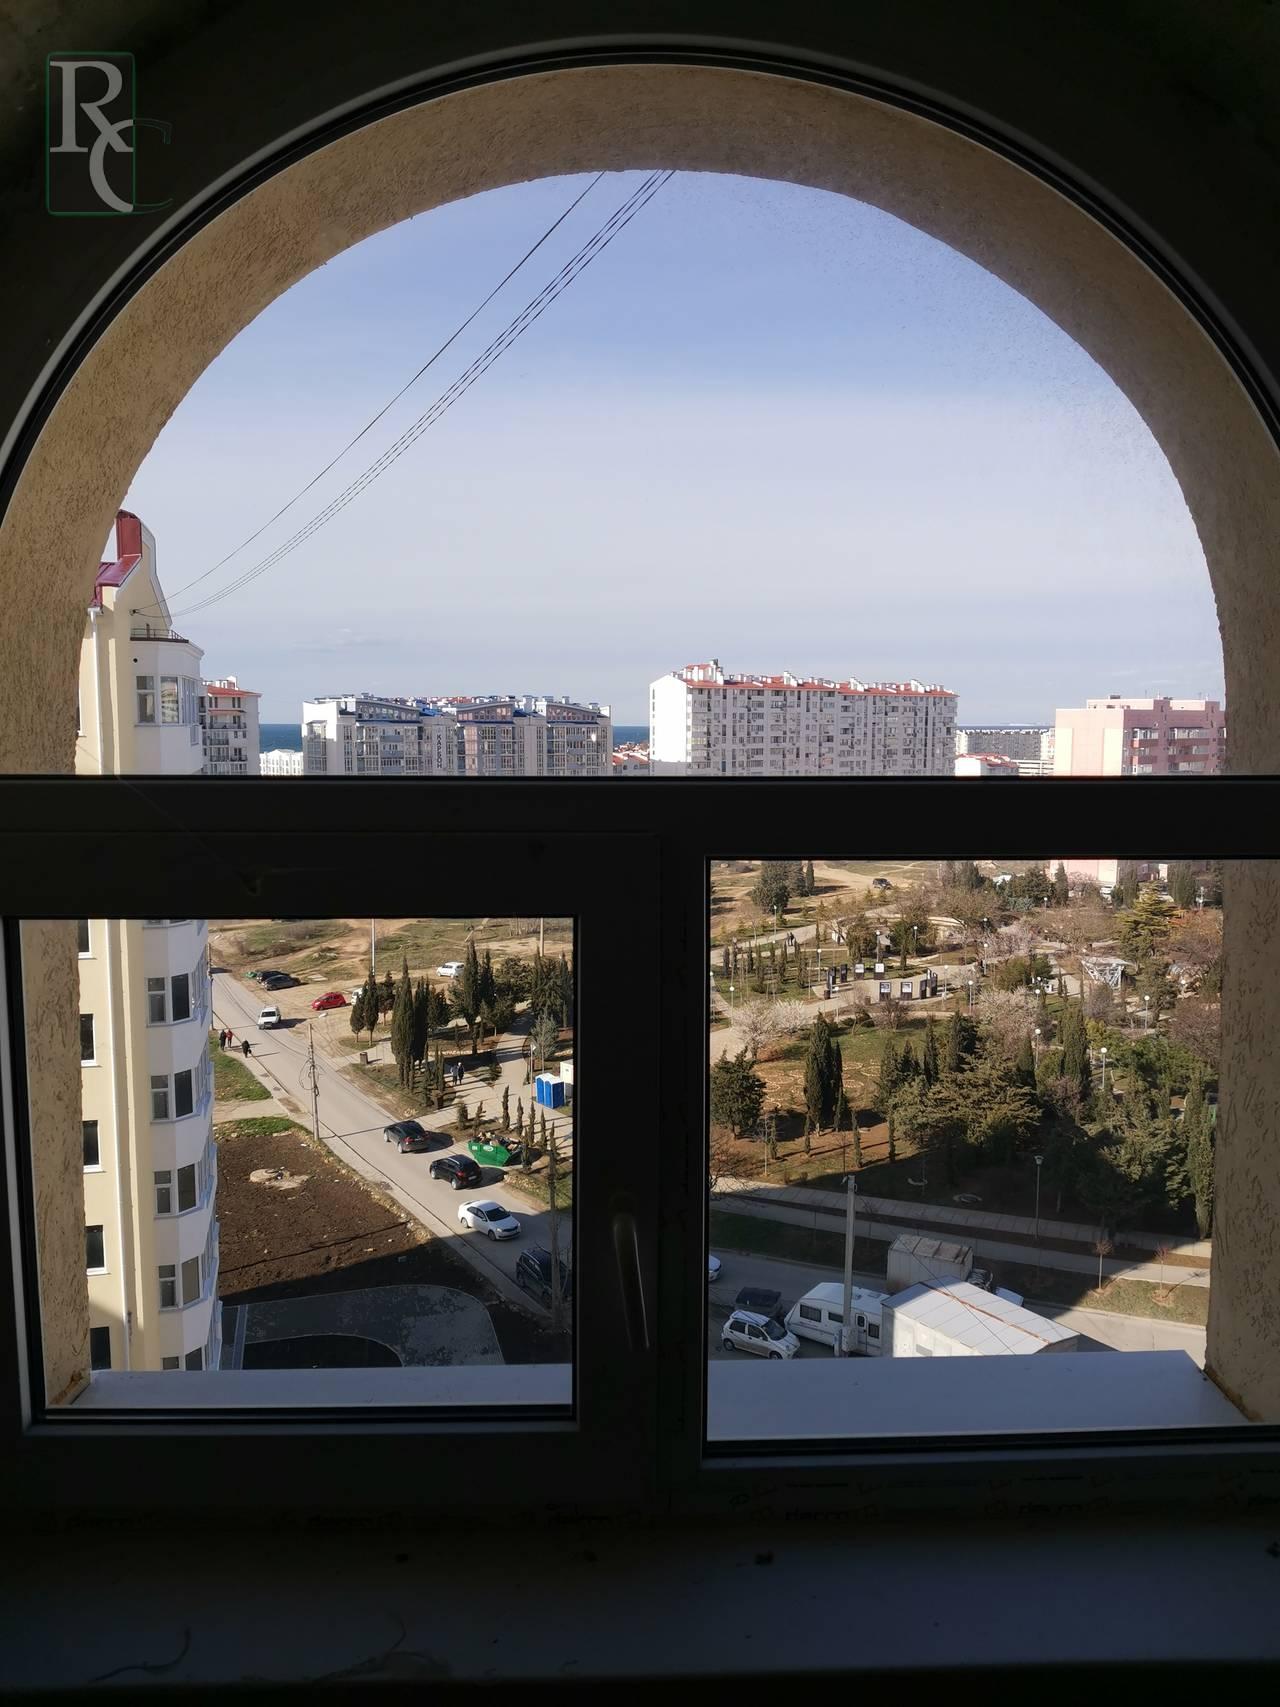 Продается четырехкомнатная квартира по ул.П.Корчагина 19Б, к.1.